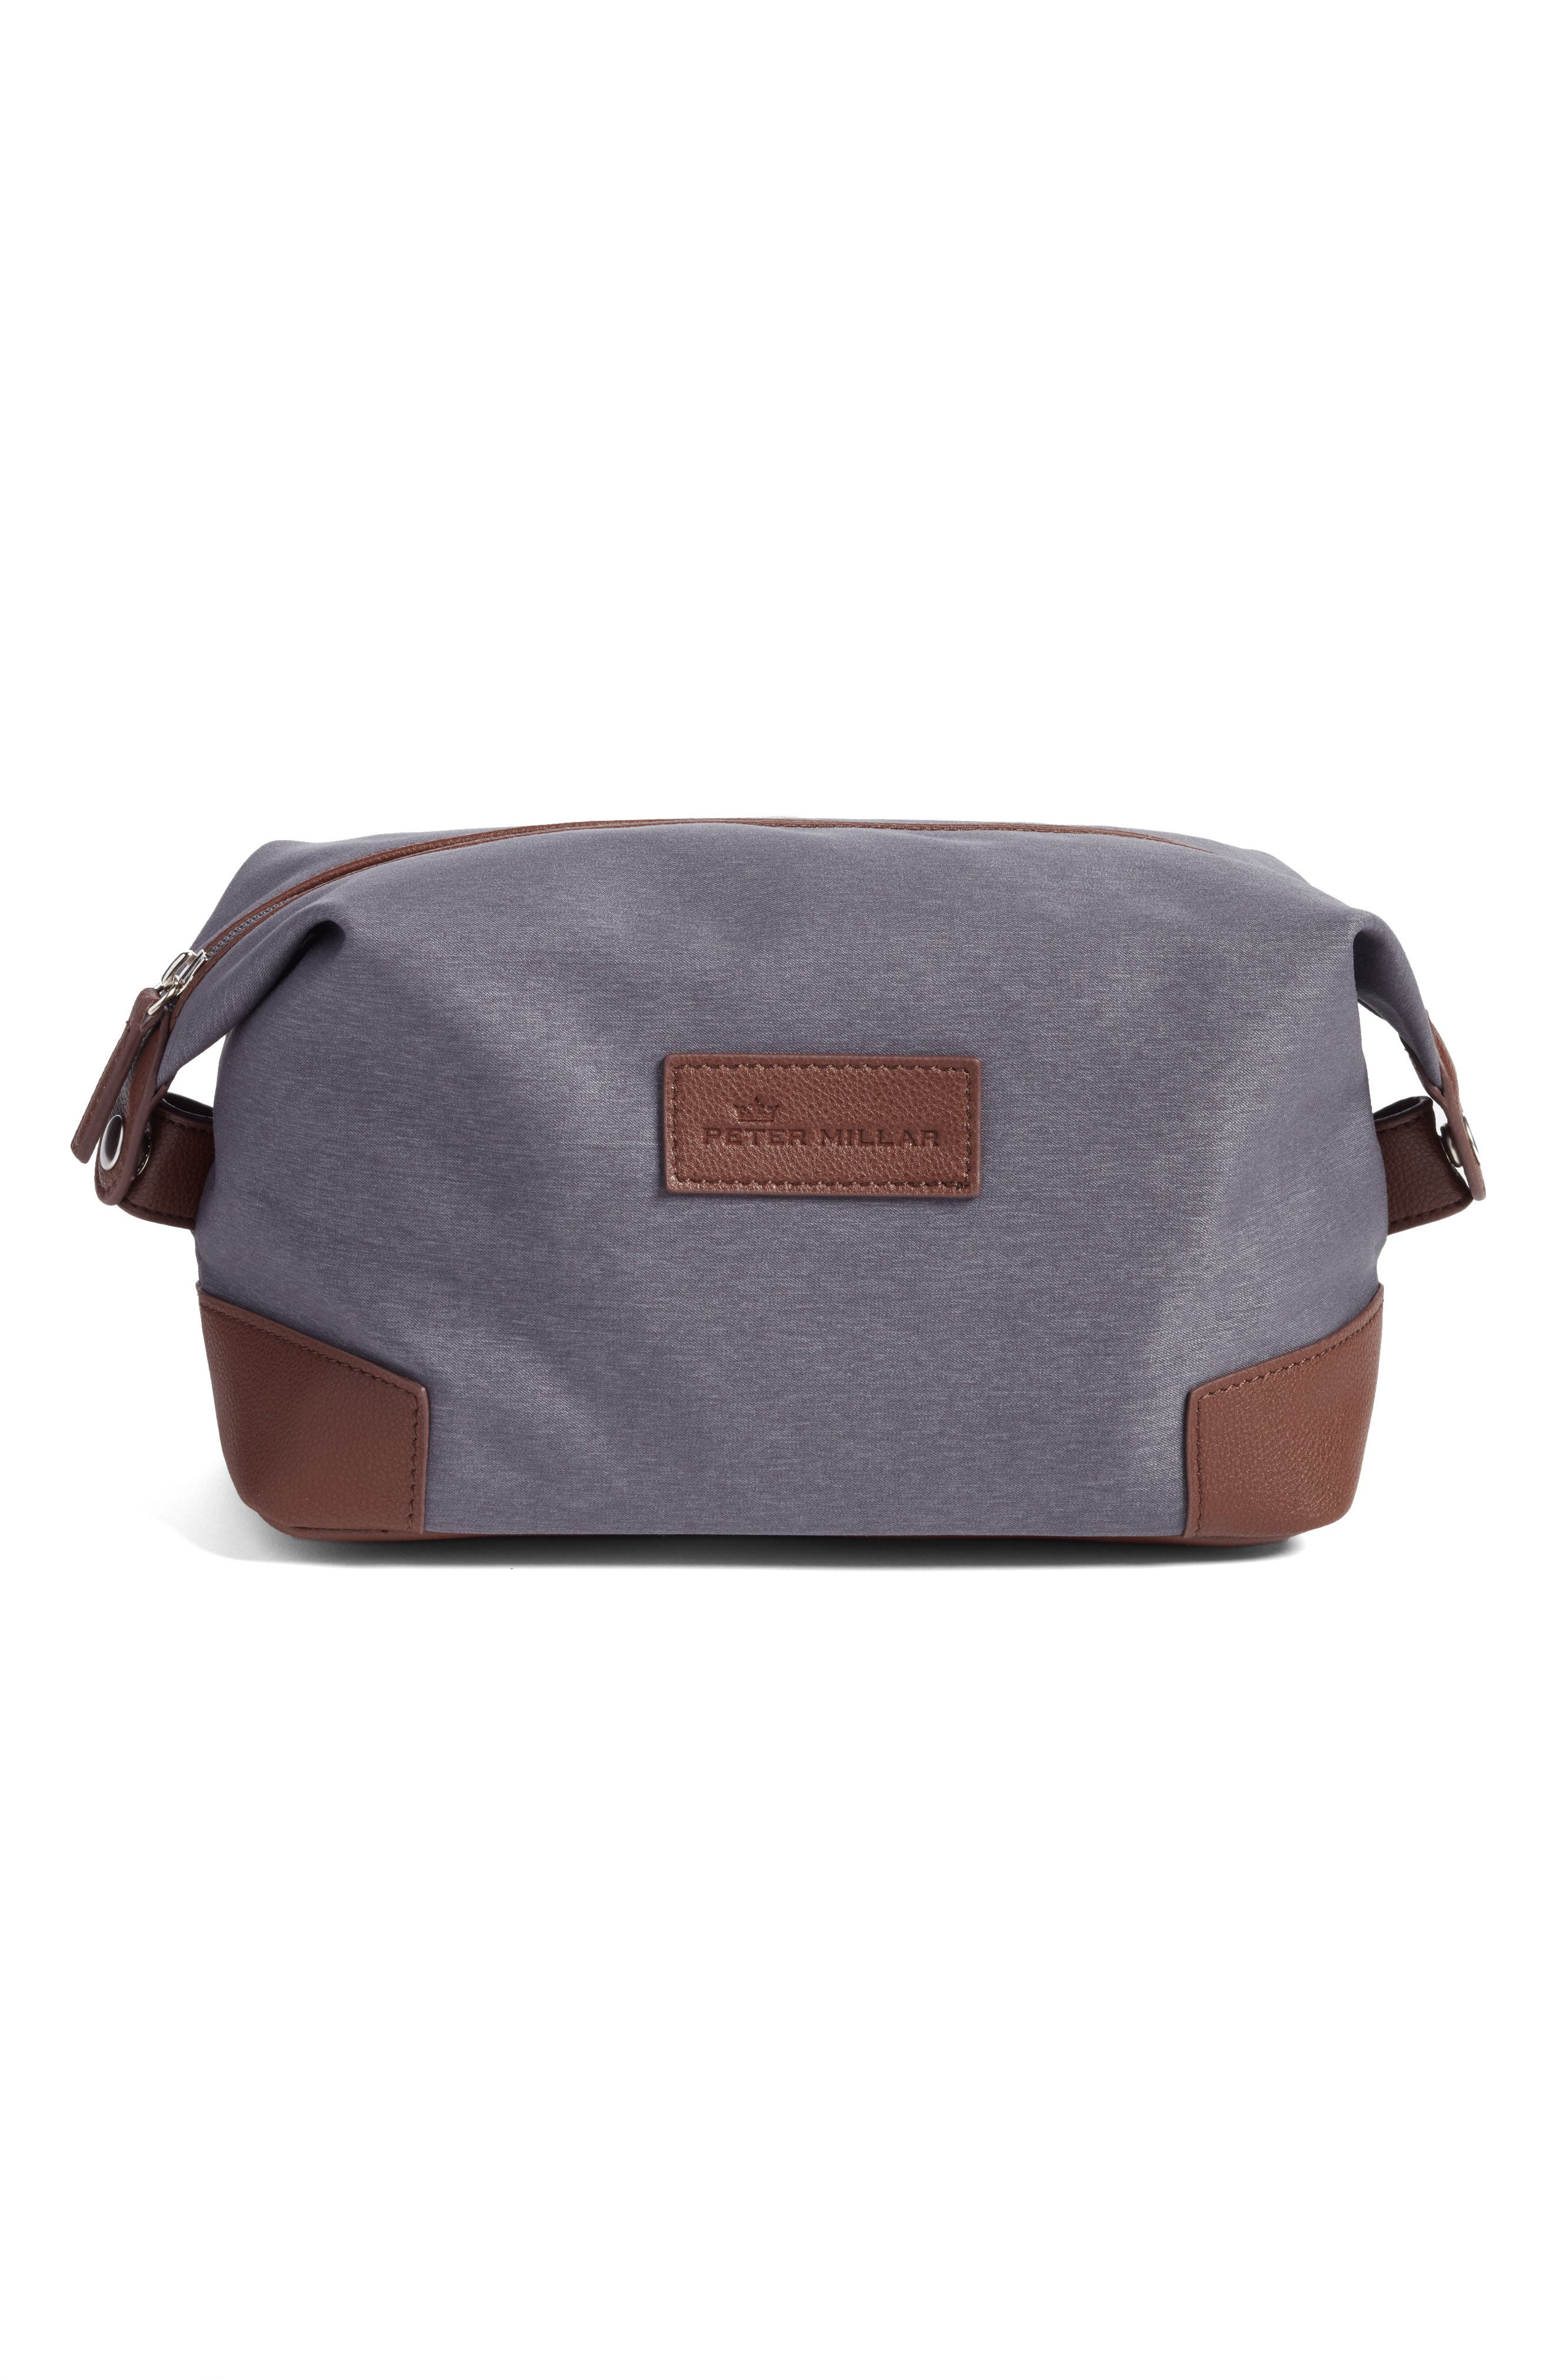 Heathered Twill Dopp Kit,                         Main,                         color, Charcoal